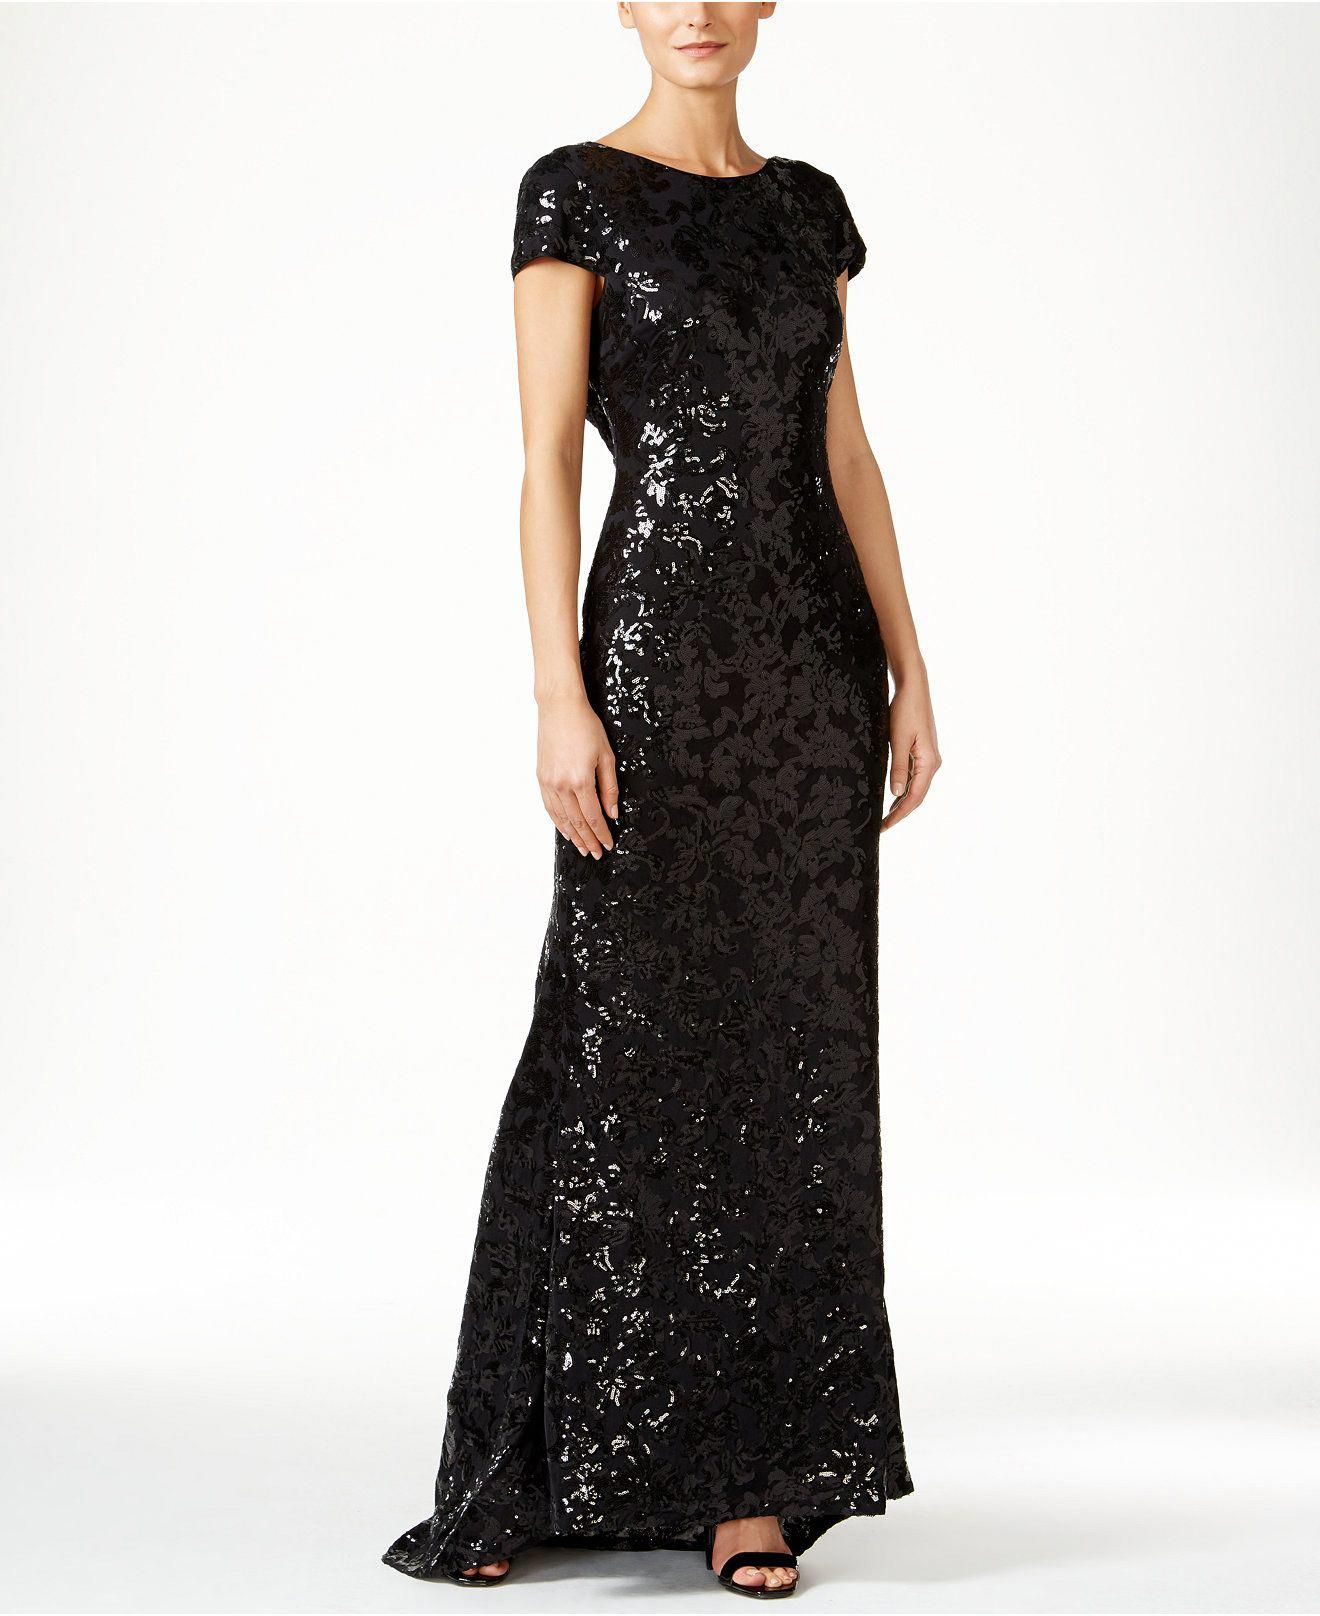 9bd019b9910c Calvin Klein Sequined Cap-Sleeve Gown - Dresses - Women - Macy s  209.00   Cluboutfitsforwomen